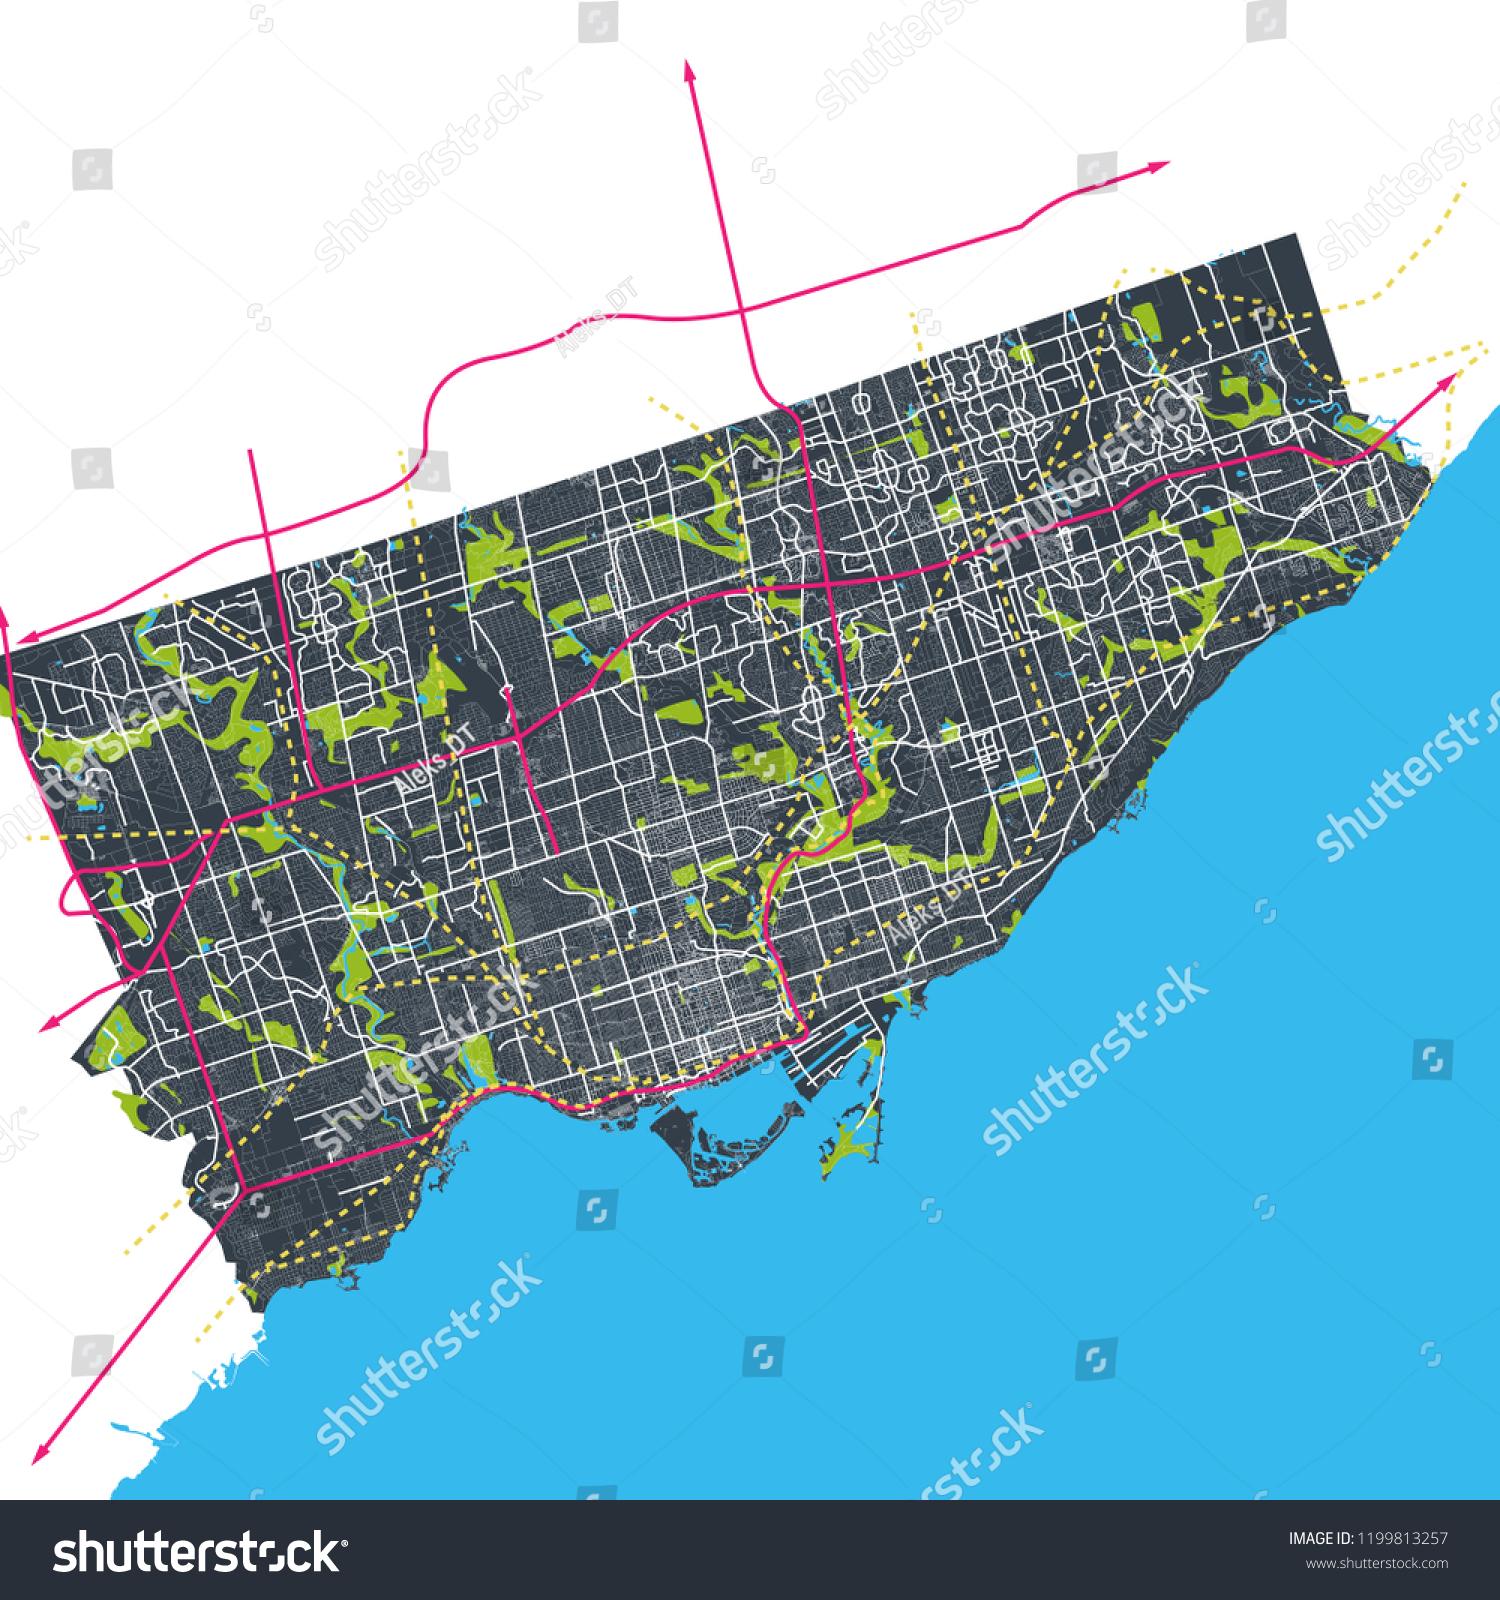 Map Of Canada Roads.Toronto Ontario Canada Interconnected Roads Streets Stock Vector